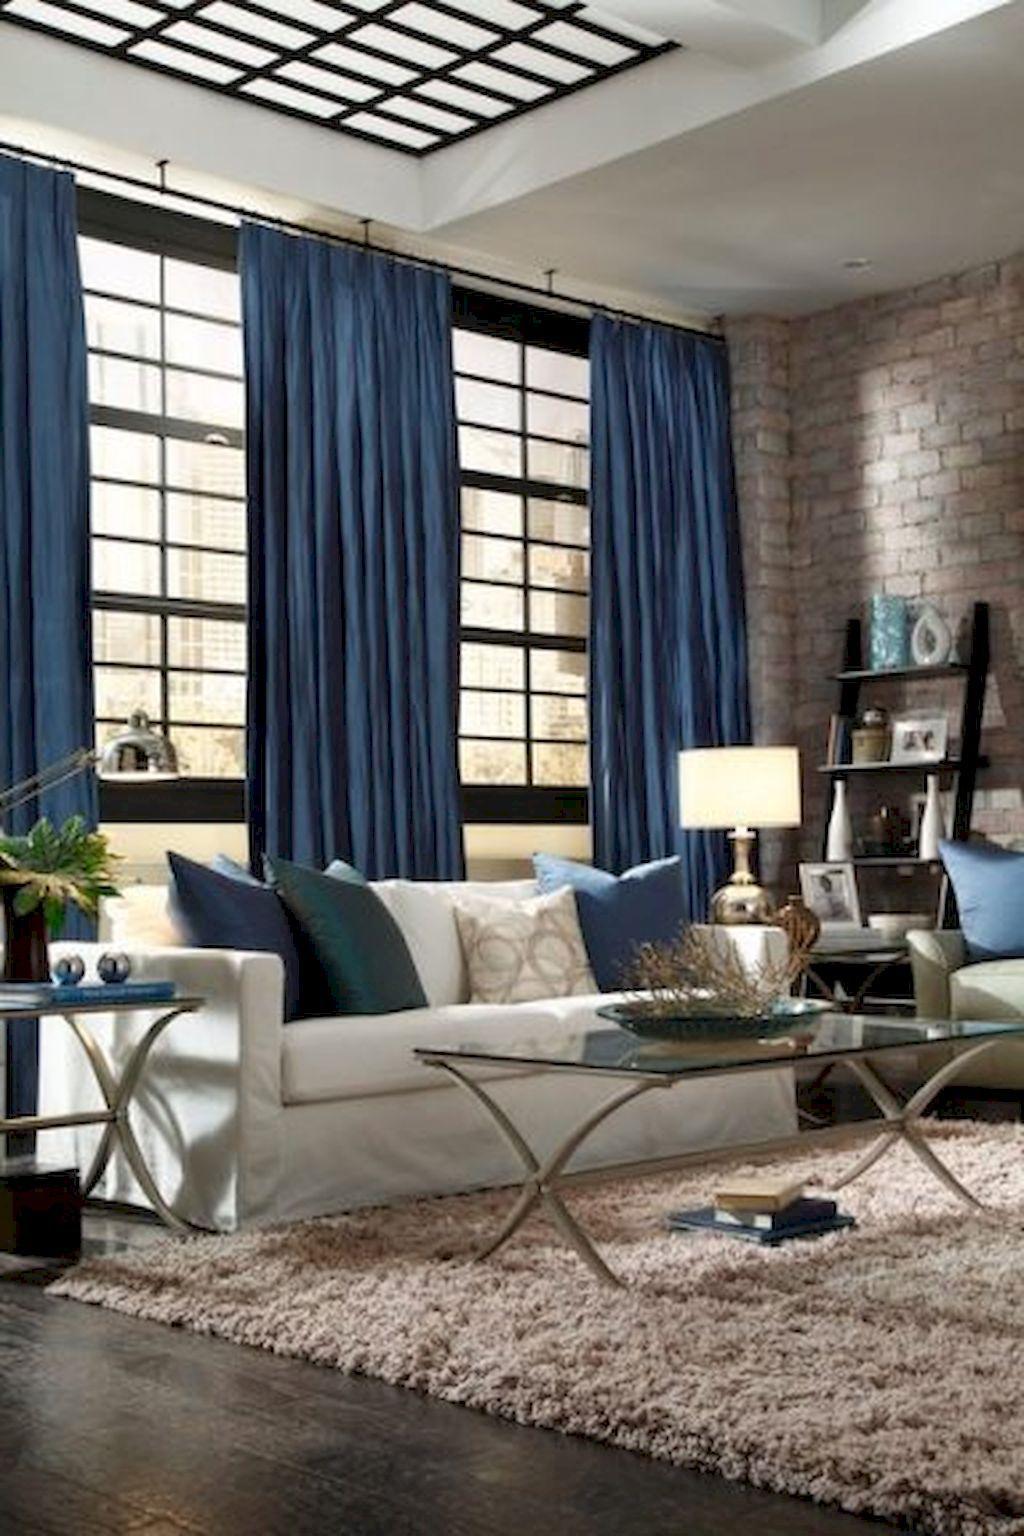 80 Contemporary Living Room Decoration Ideas Home To Z Blue Curtains Living Room Curtains Living Room Contemporary Decor Living Room #navy #living #room #curtains